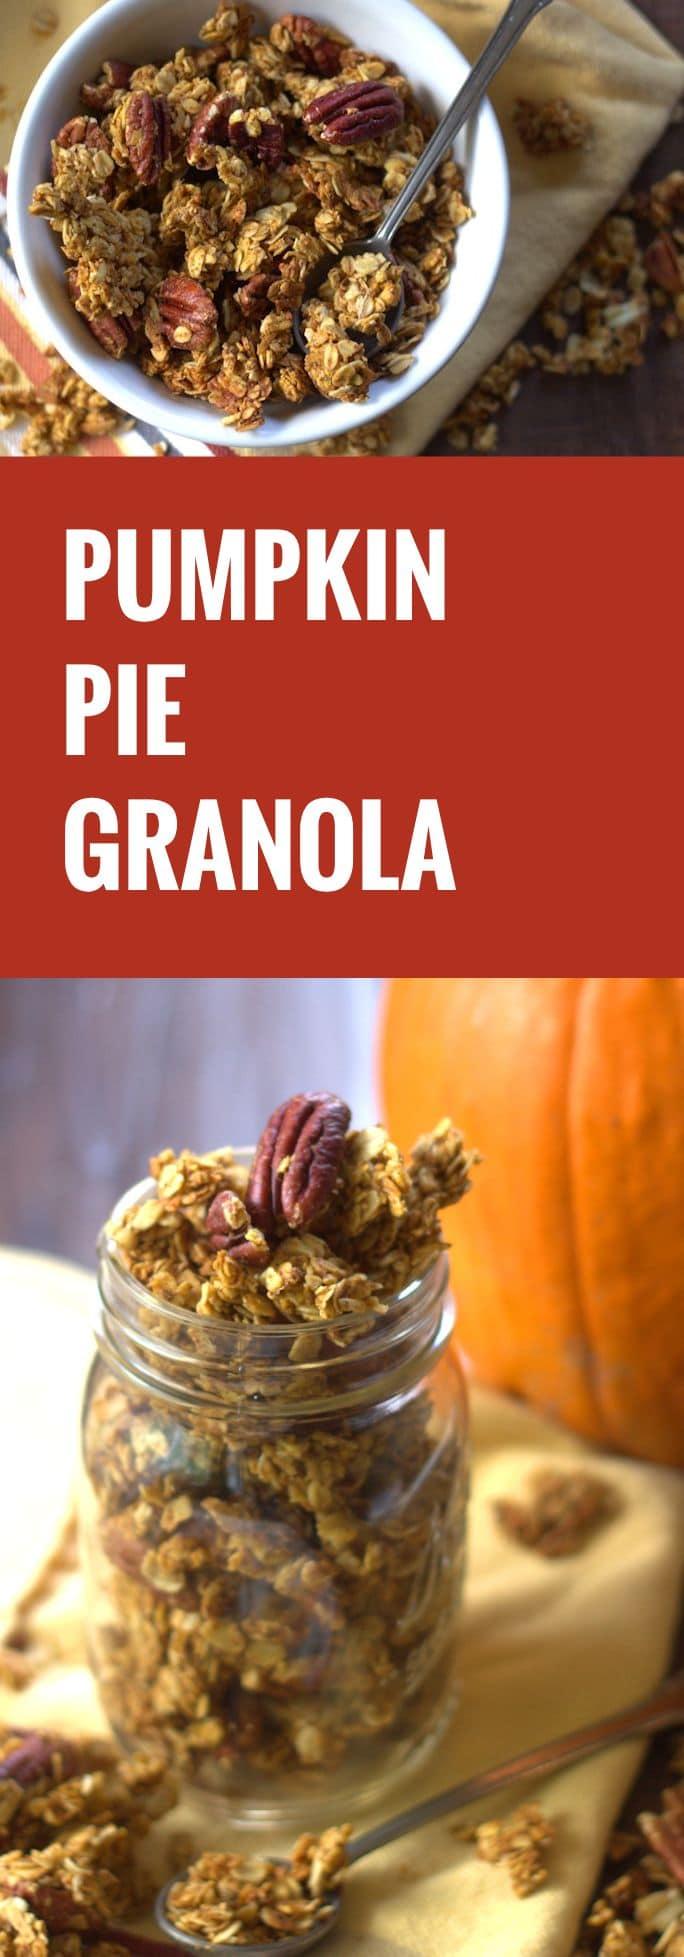 Pumpkin Pie Granola - Connoisseurus Veg